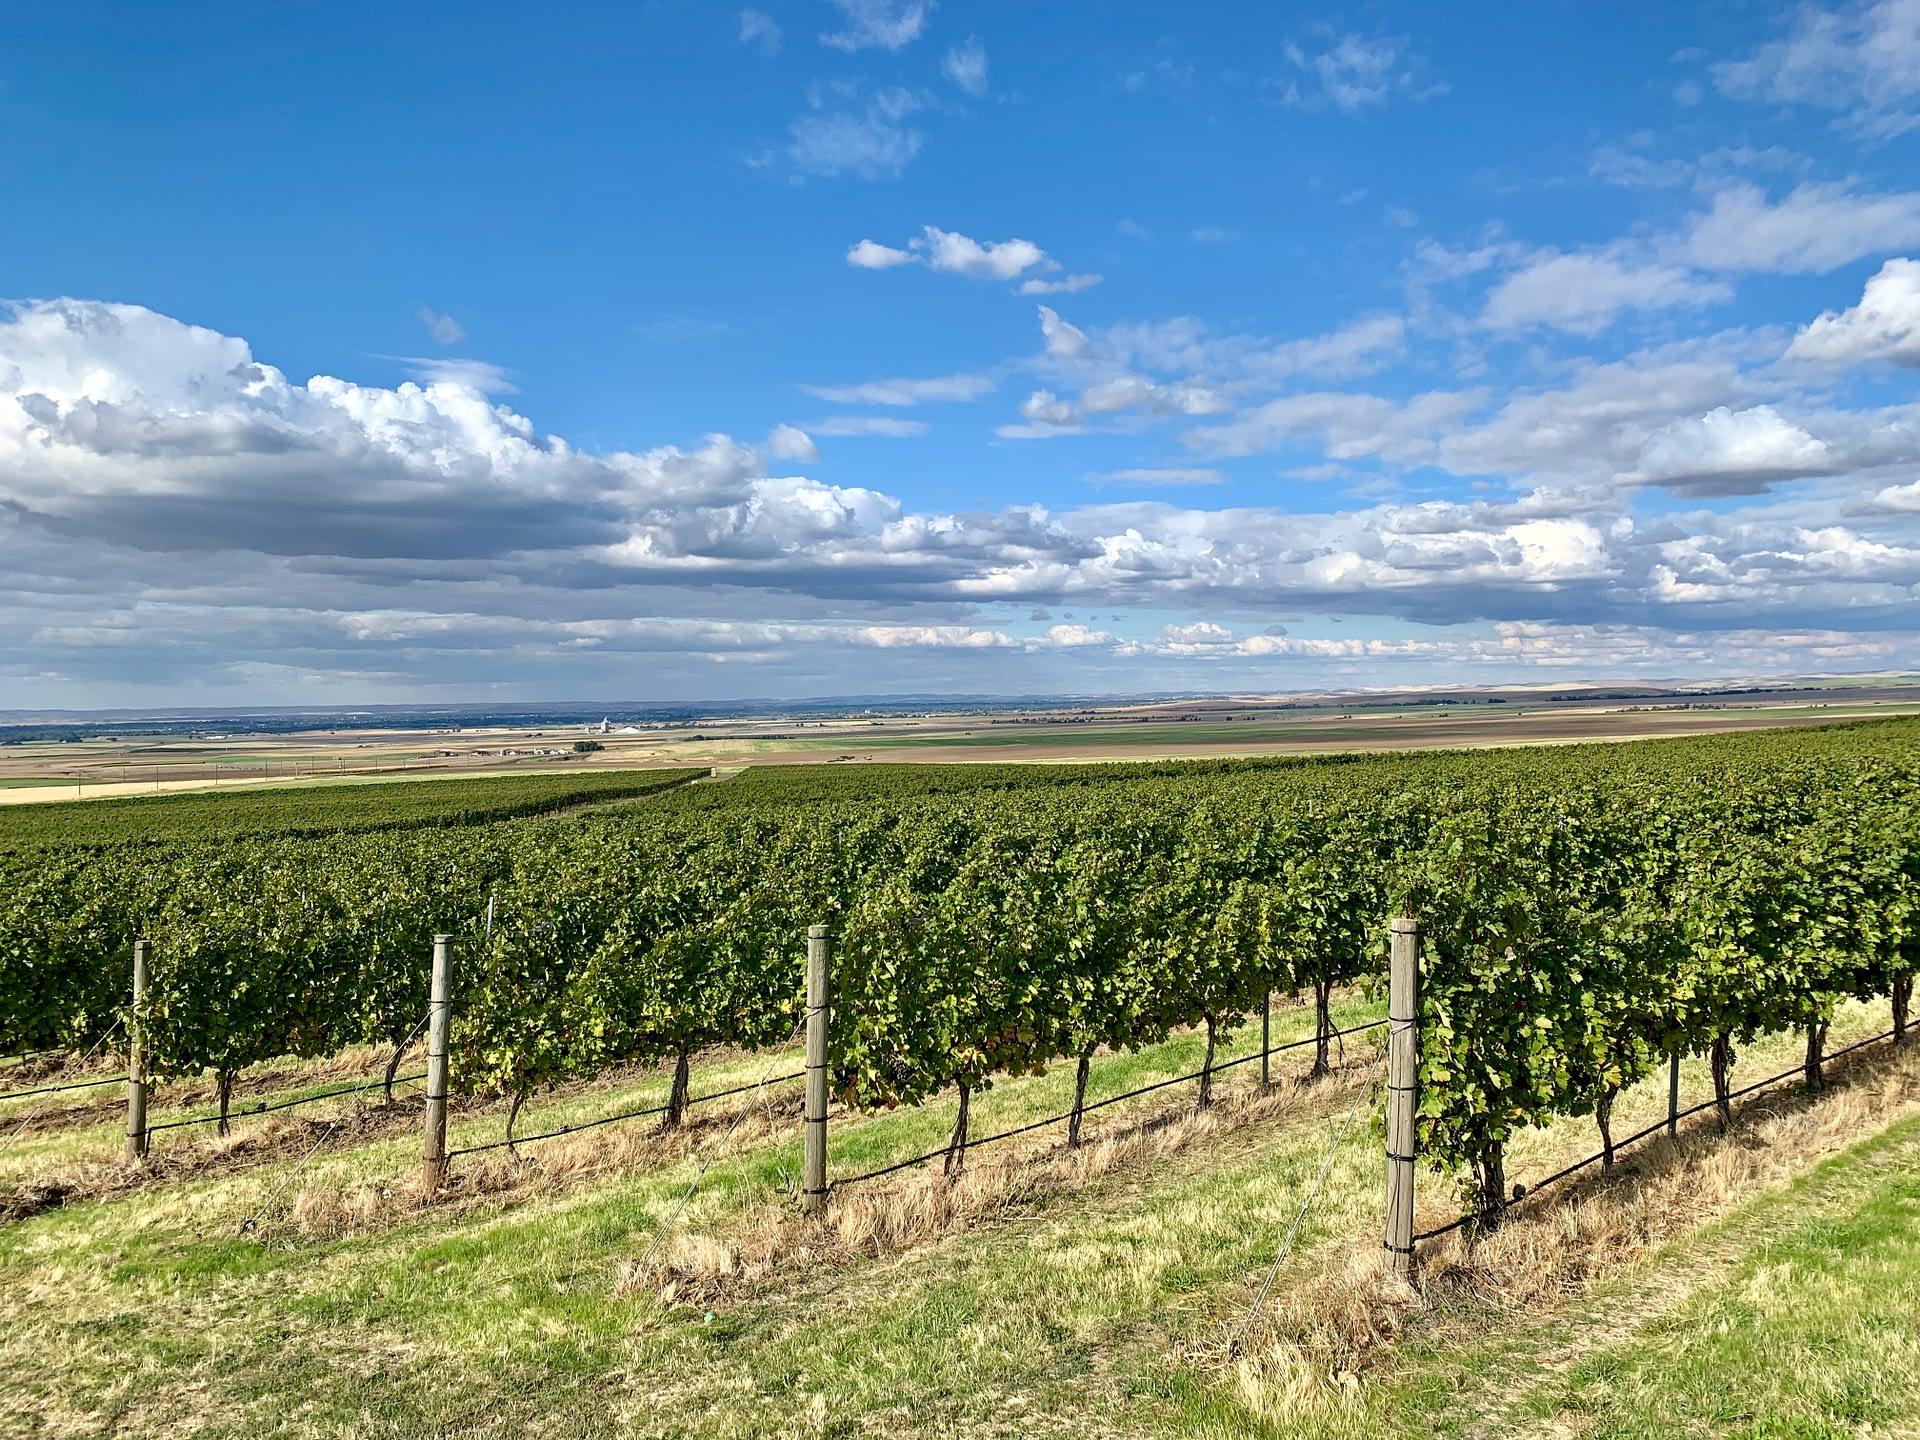 Vineyard grape rows of Zerba Wine Cellars in Walla Walla Valley Milton-Freewater, Oregon